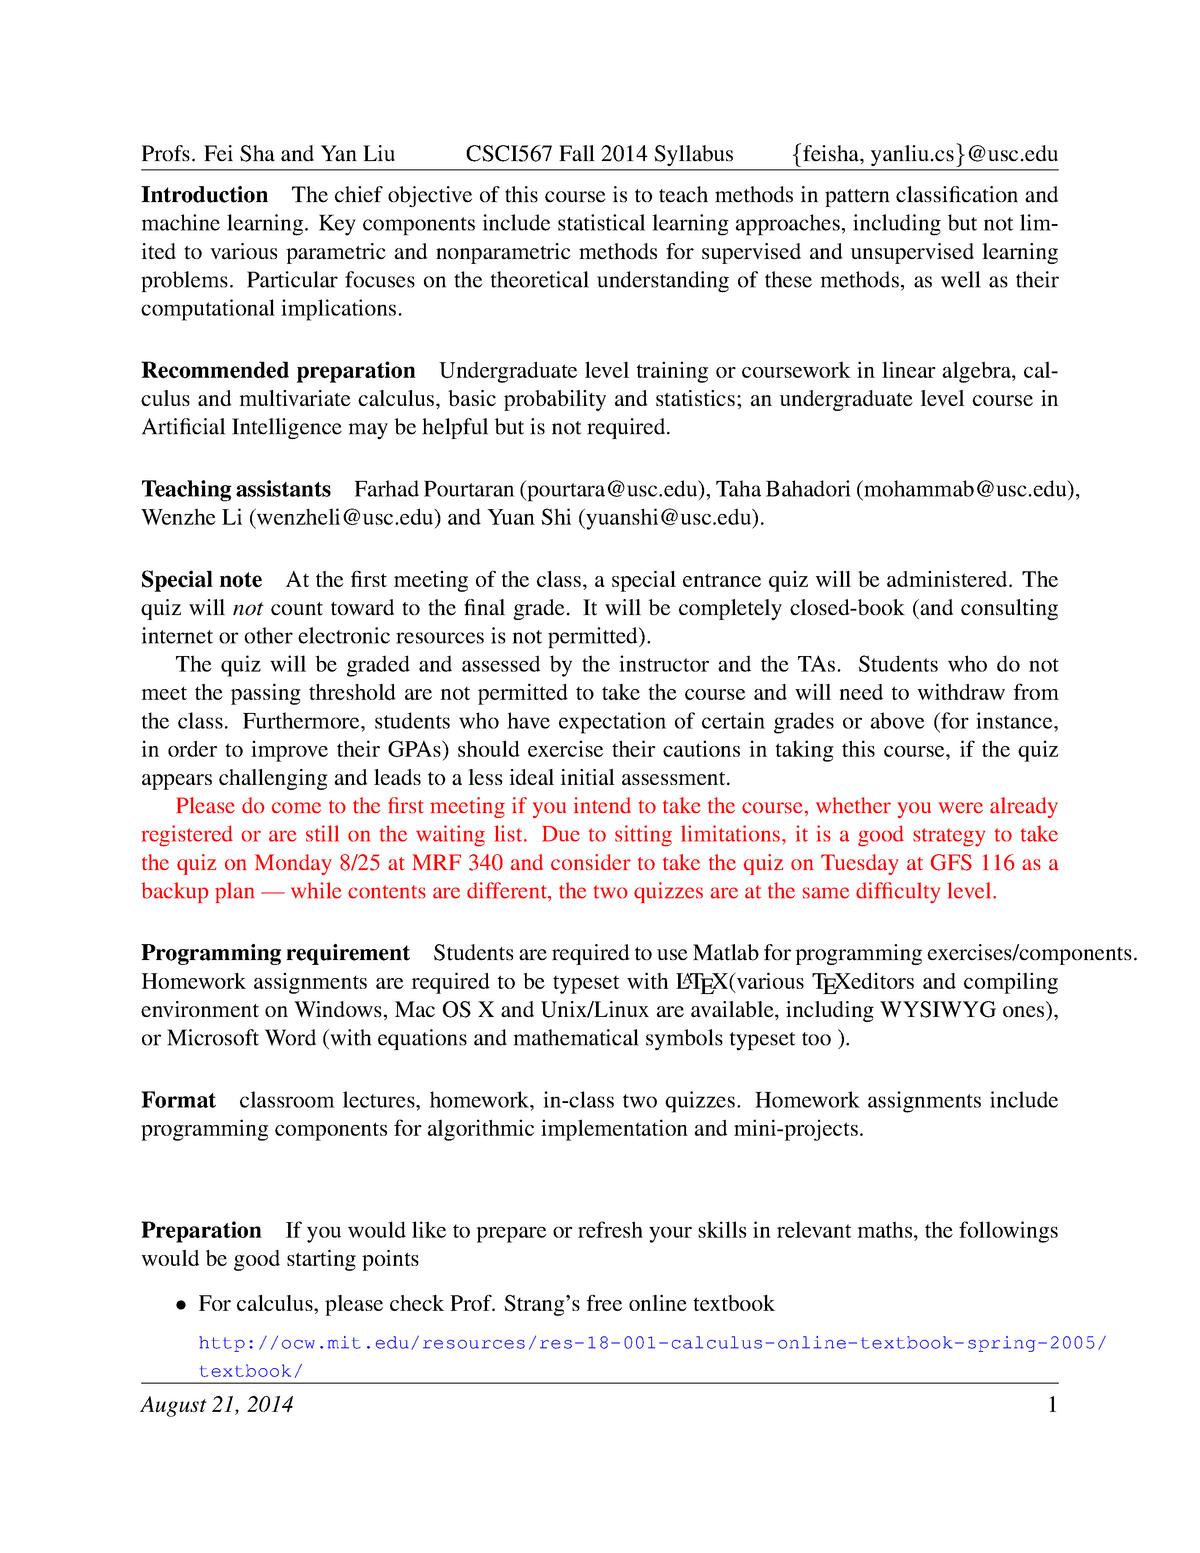 Syllabus - CSCI567: Machine Learning - StuDocu